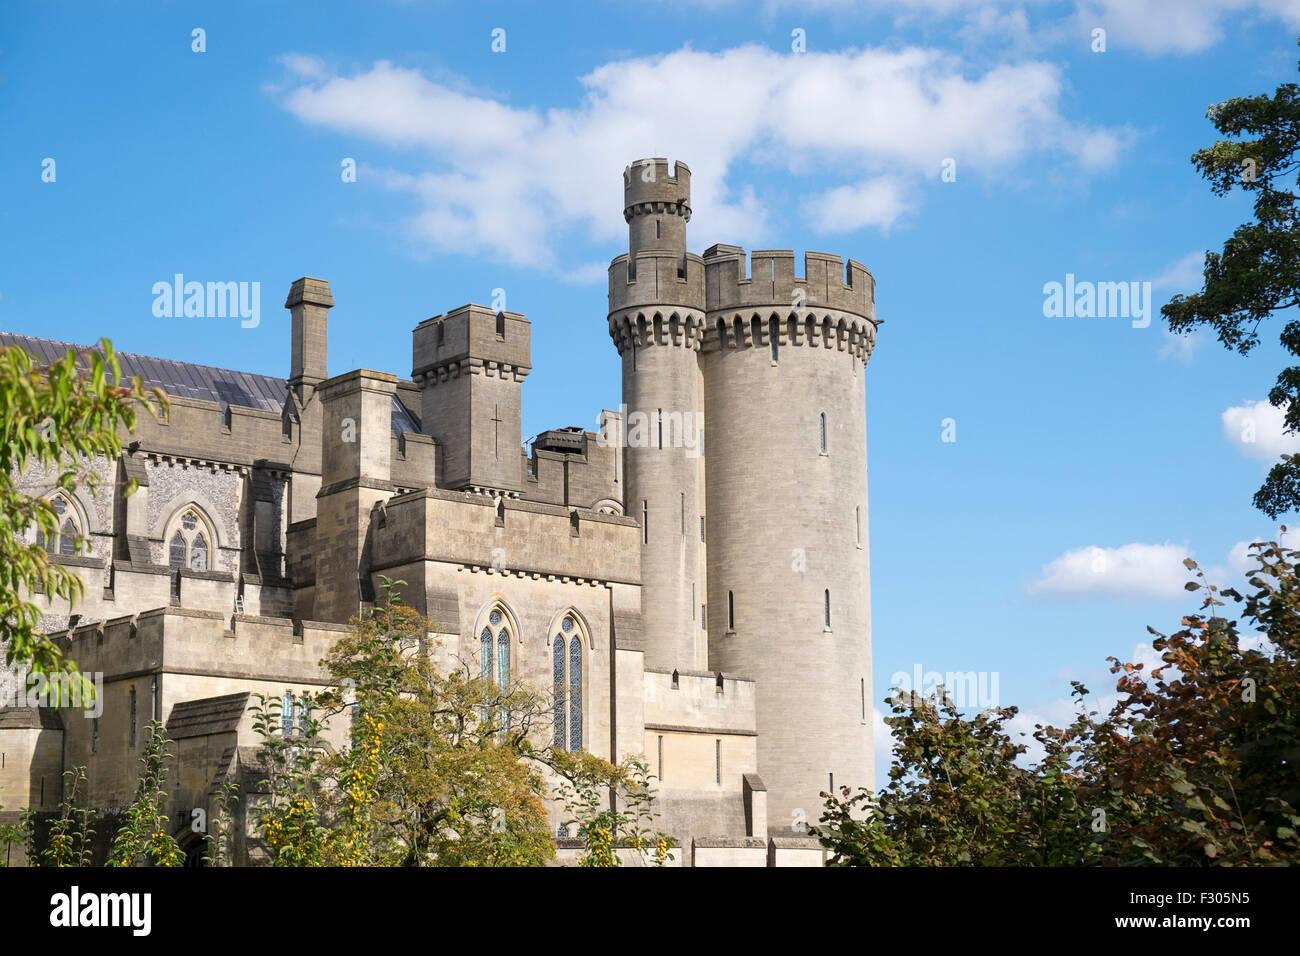 Turrets on Arundel castle framed between trees - Stock Image